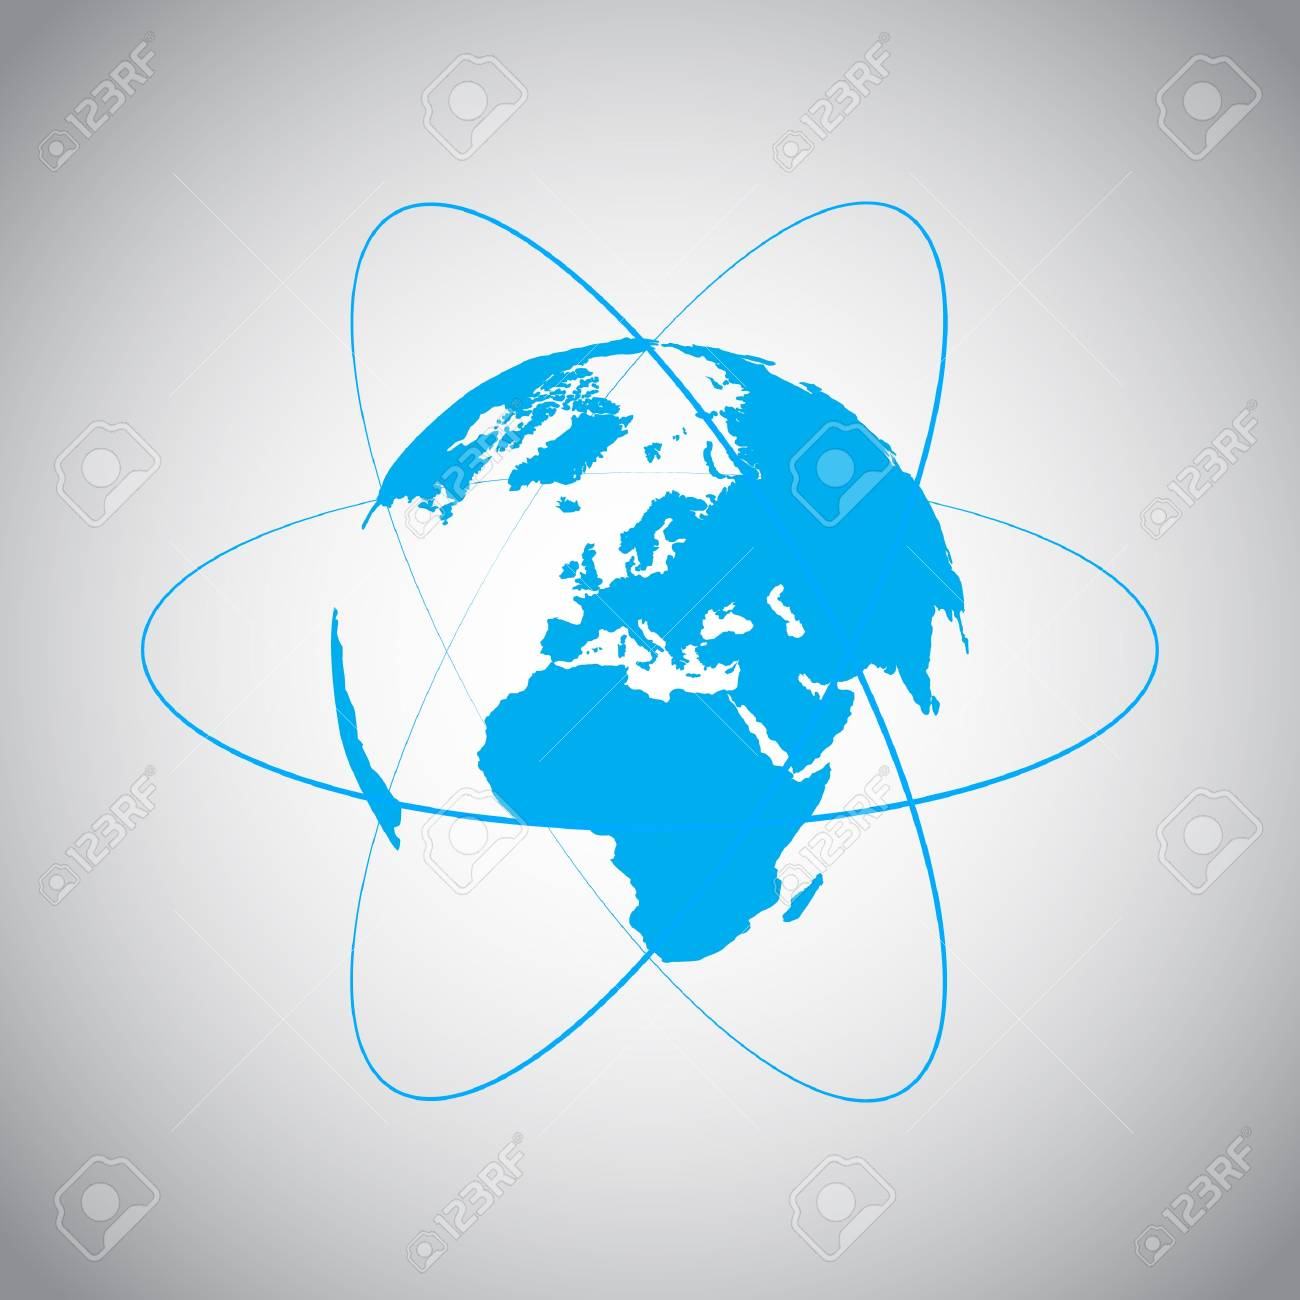 Internet and World symbol Stock Vector - 17529257